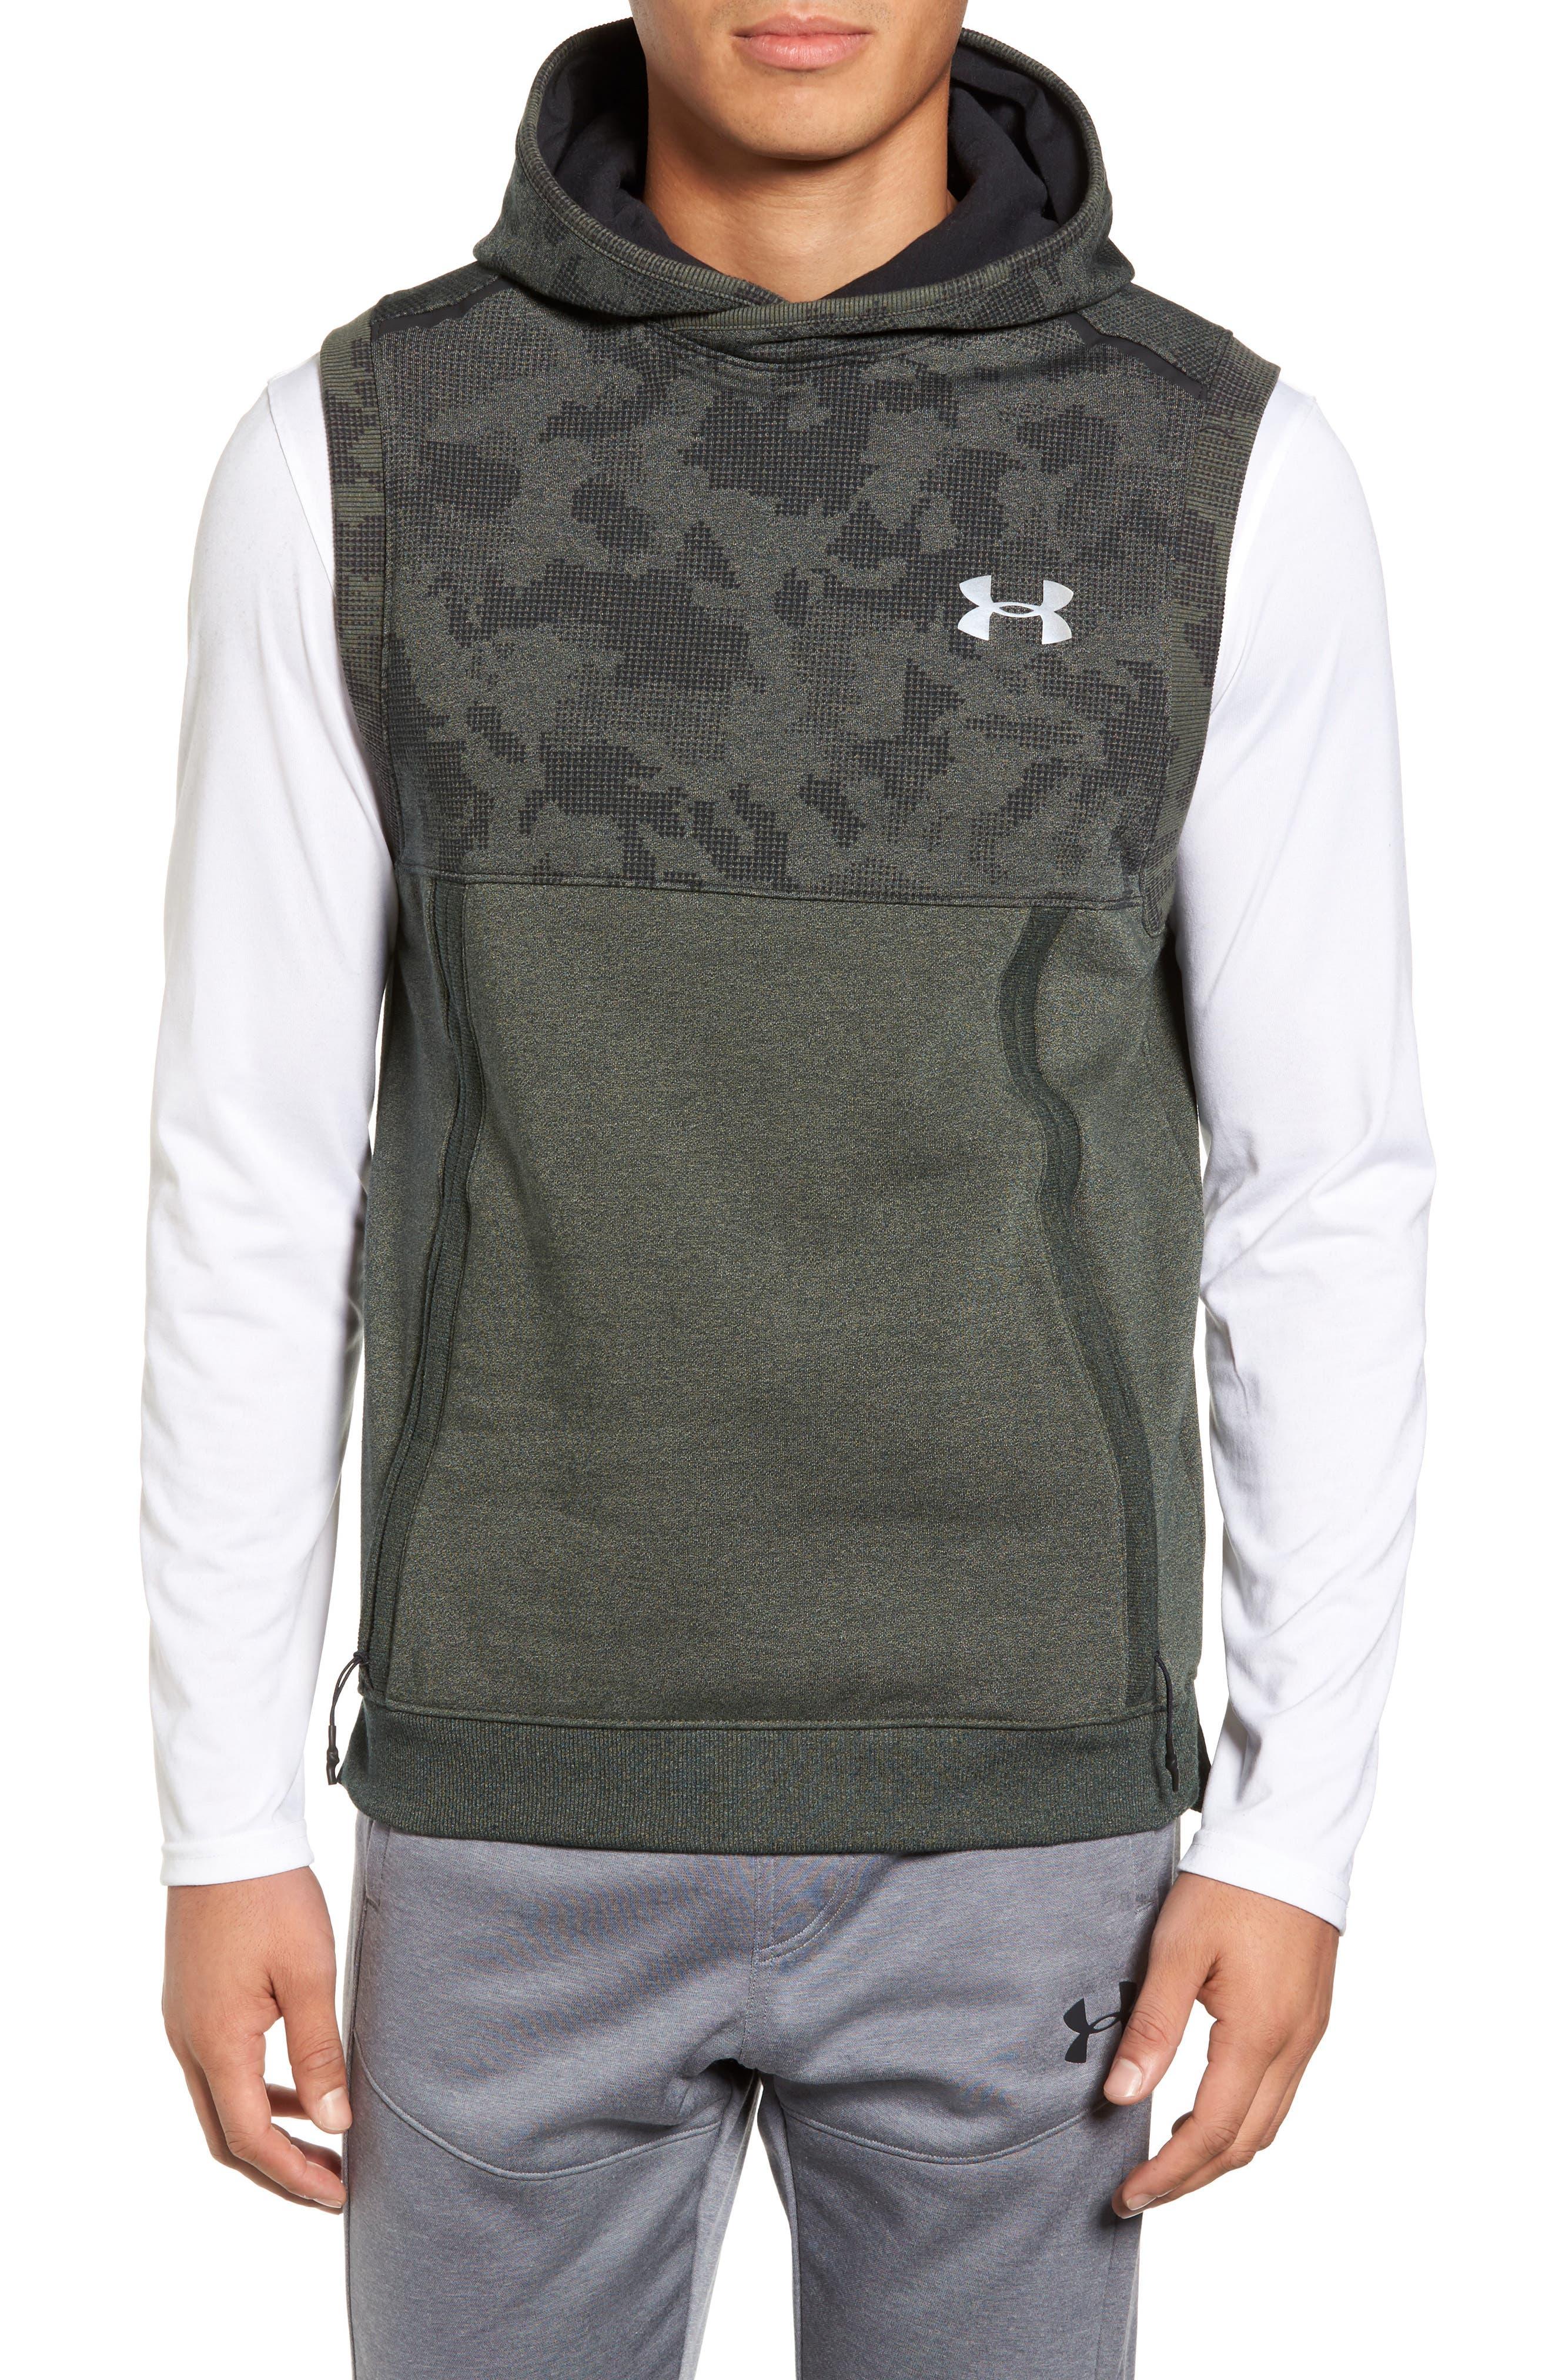 Threadborne Hooded Vest,                         Main,                         color, Downtown Green / Refletive